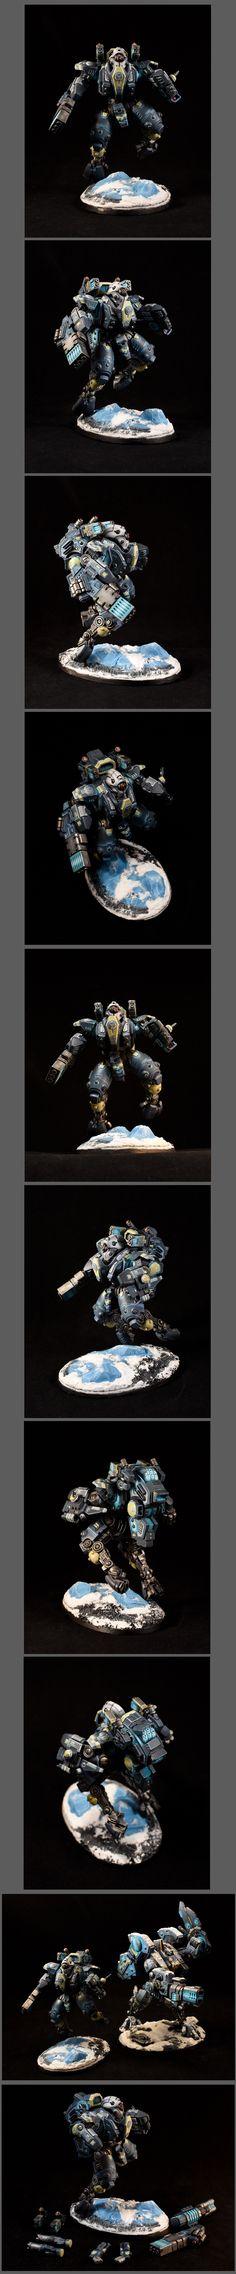 Tau Ghostkeel XV95 Battlesuit